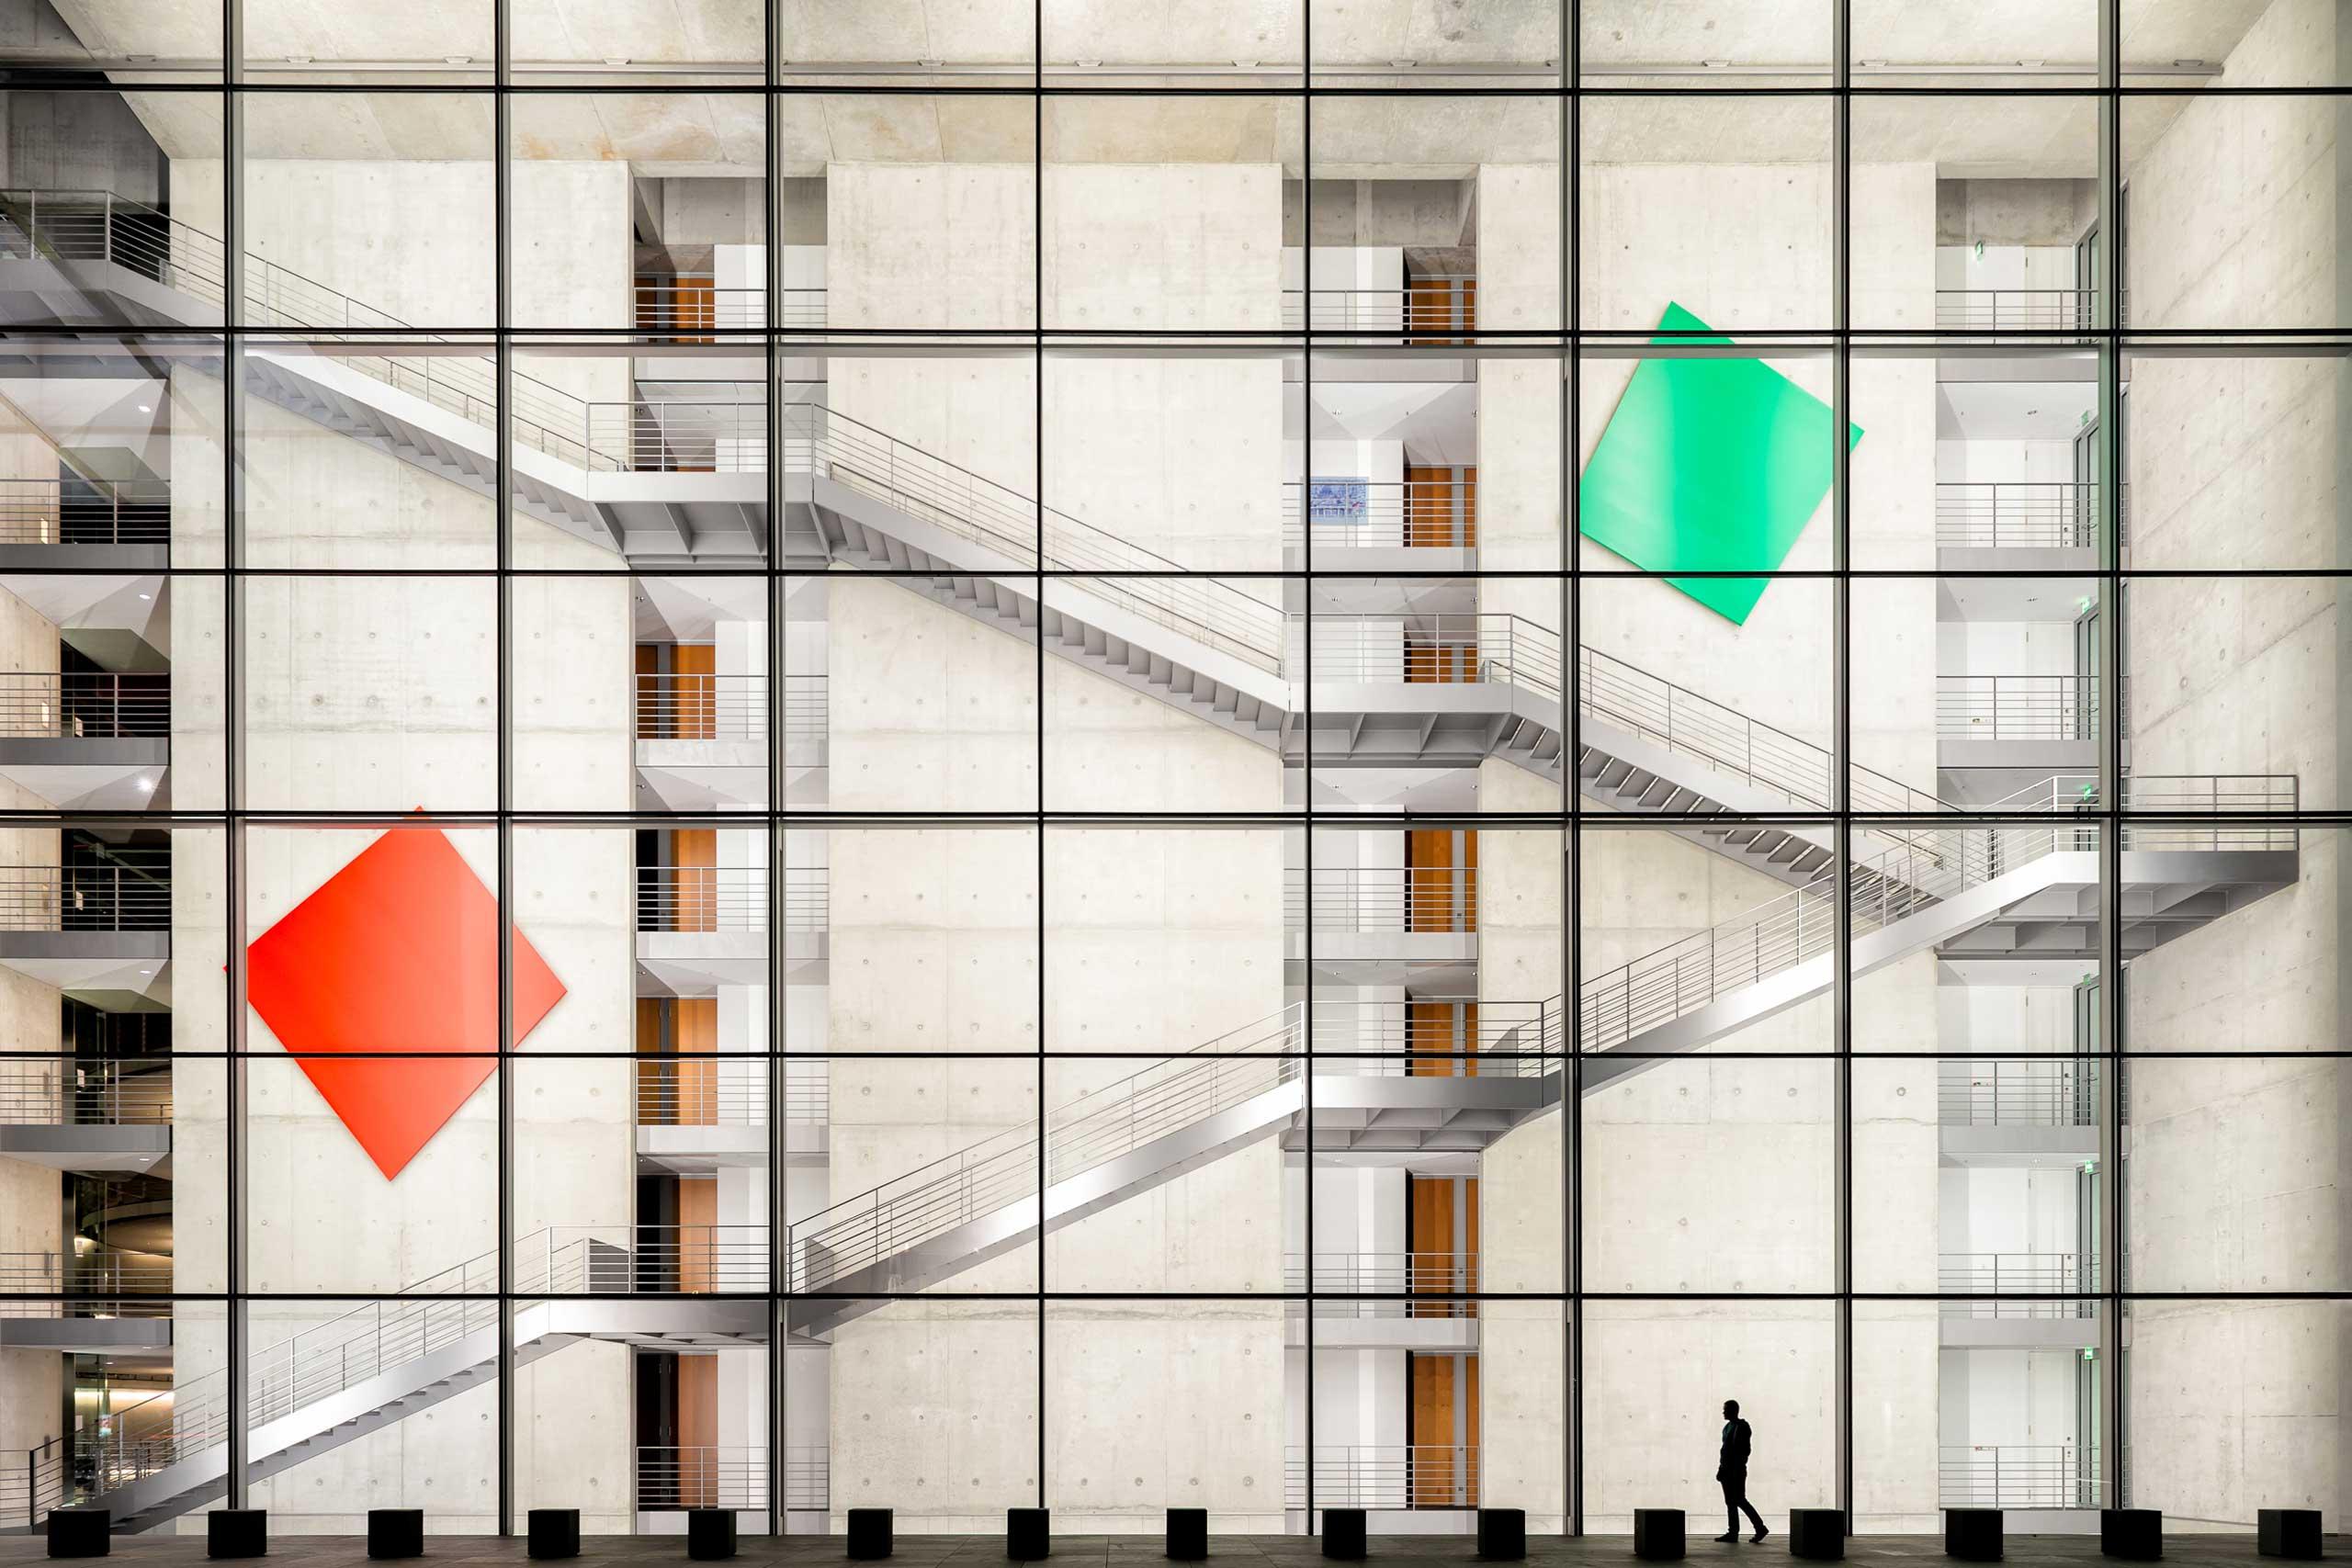 Nominated in the Architecture category. Jürgen Schrepfer's work on architecture in Berlin.